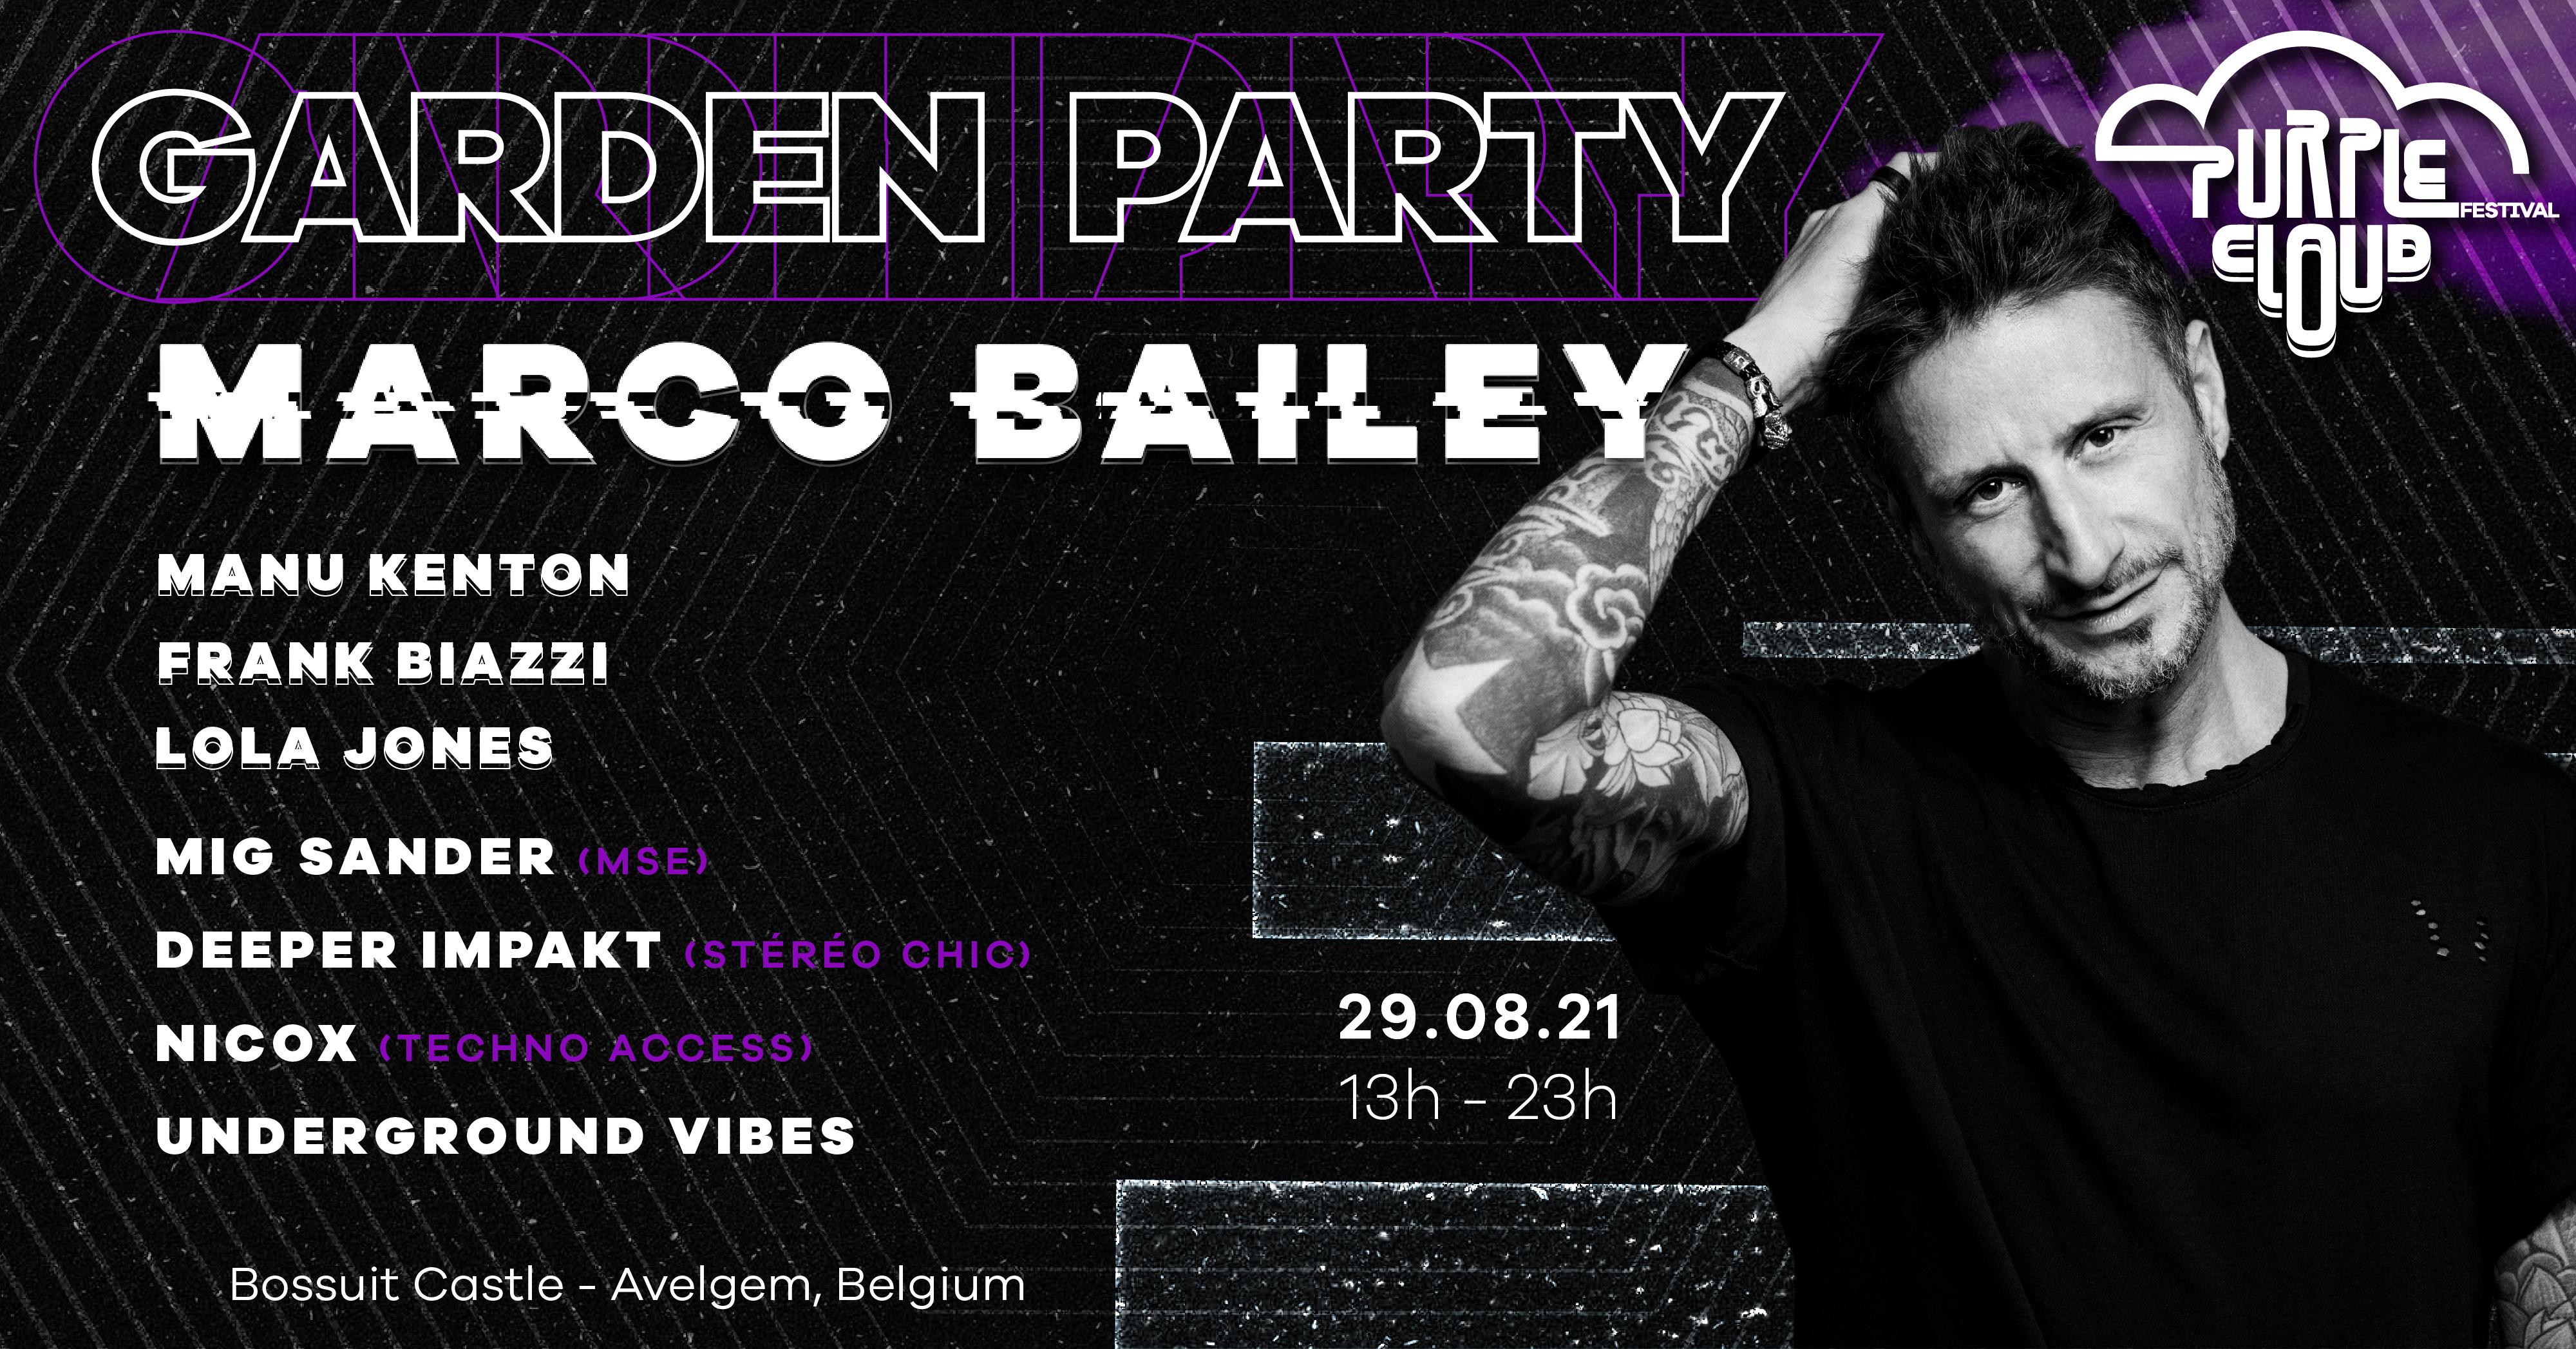 Garden Party | Purple Cloud Festival invite Marco Bailey & more